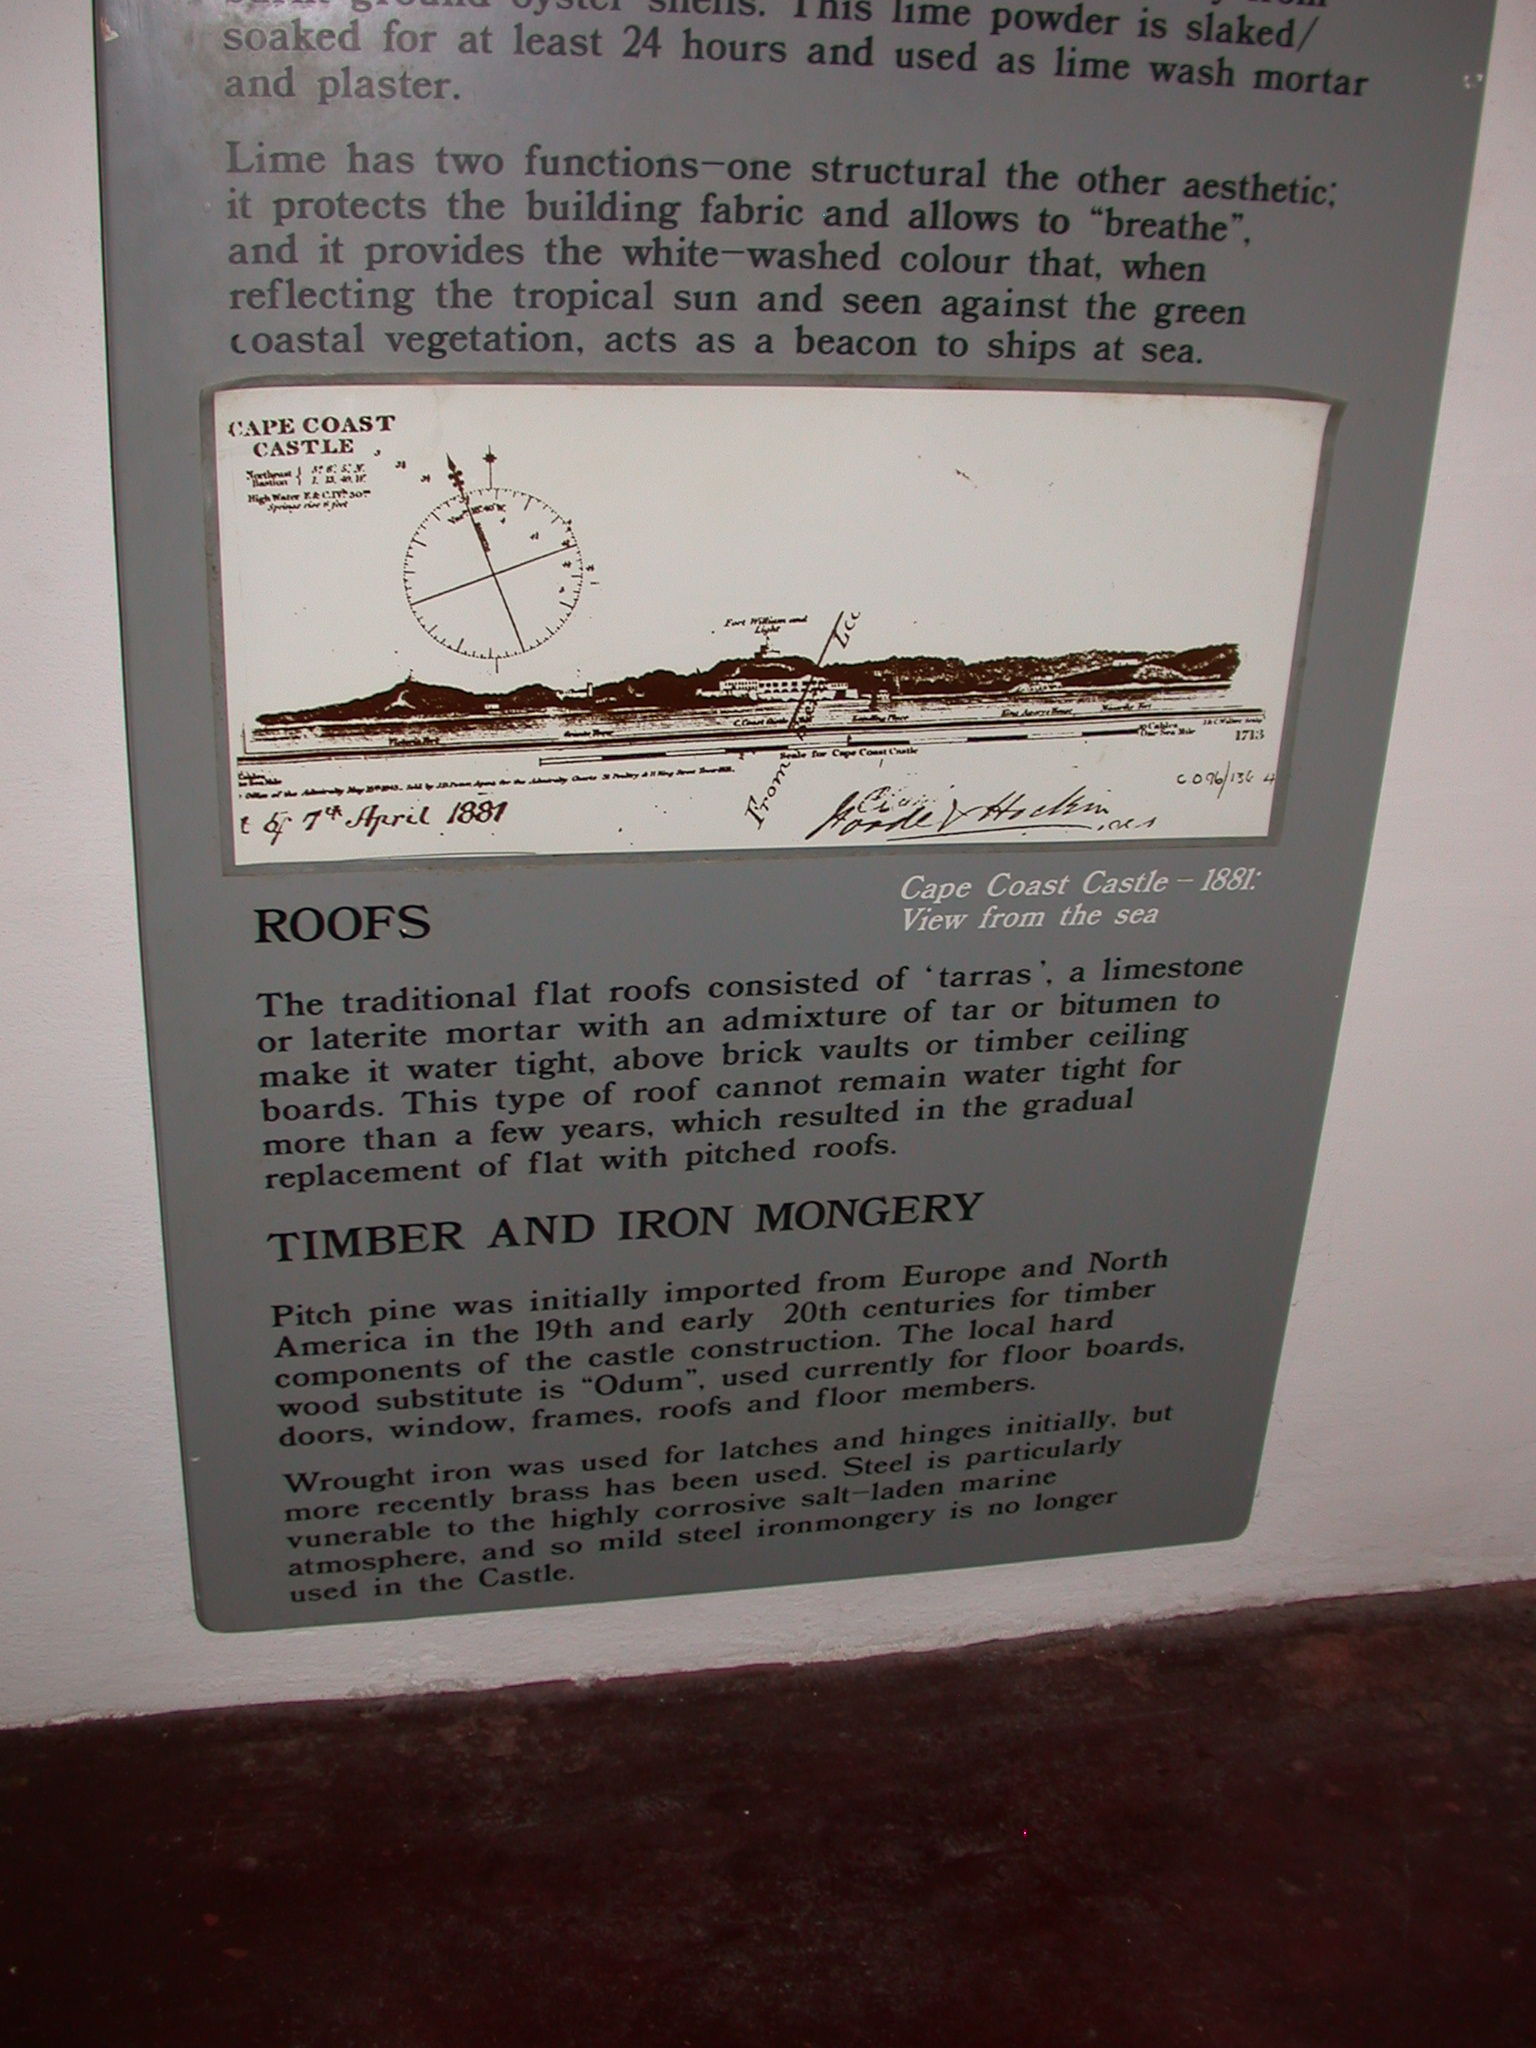 Construction Materials Description, Cape Coast Slave Fort Museum, Cape Coast, Ghana